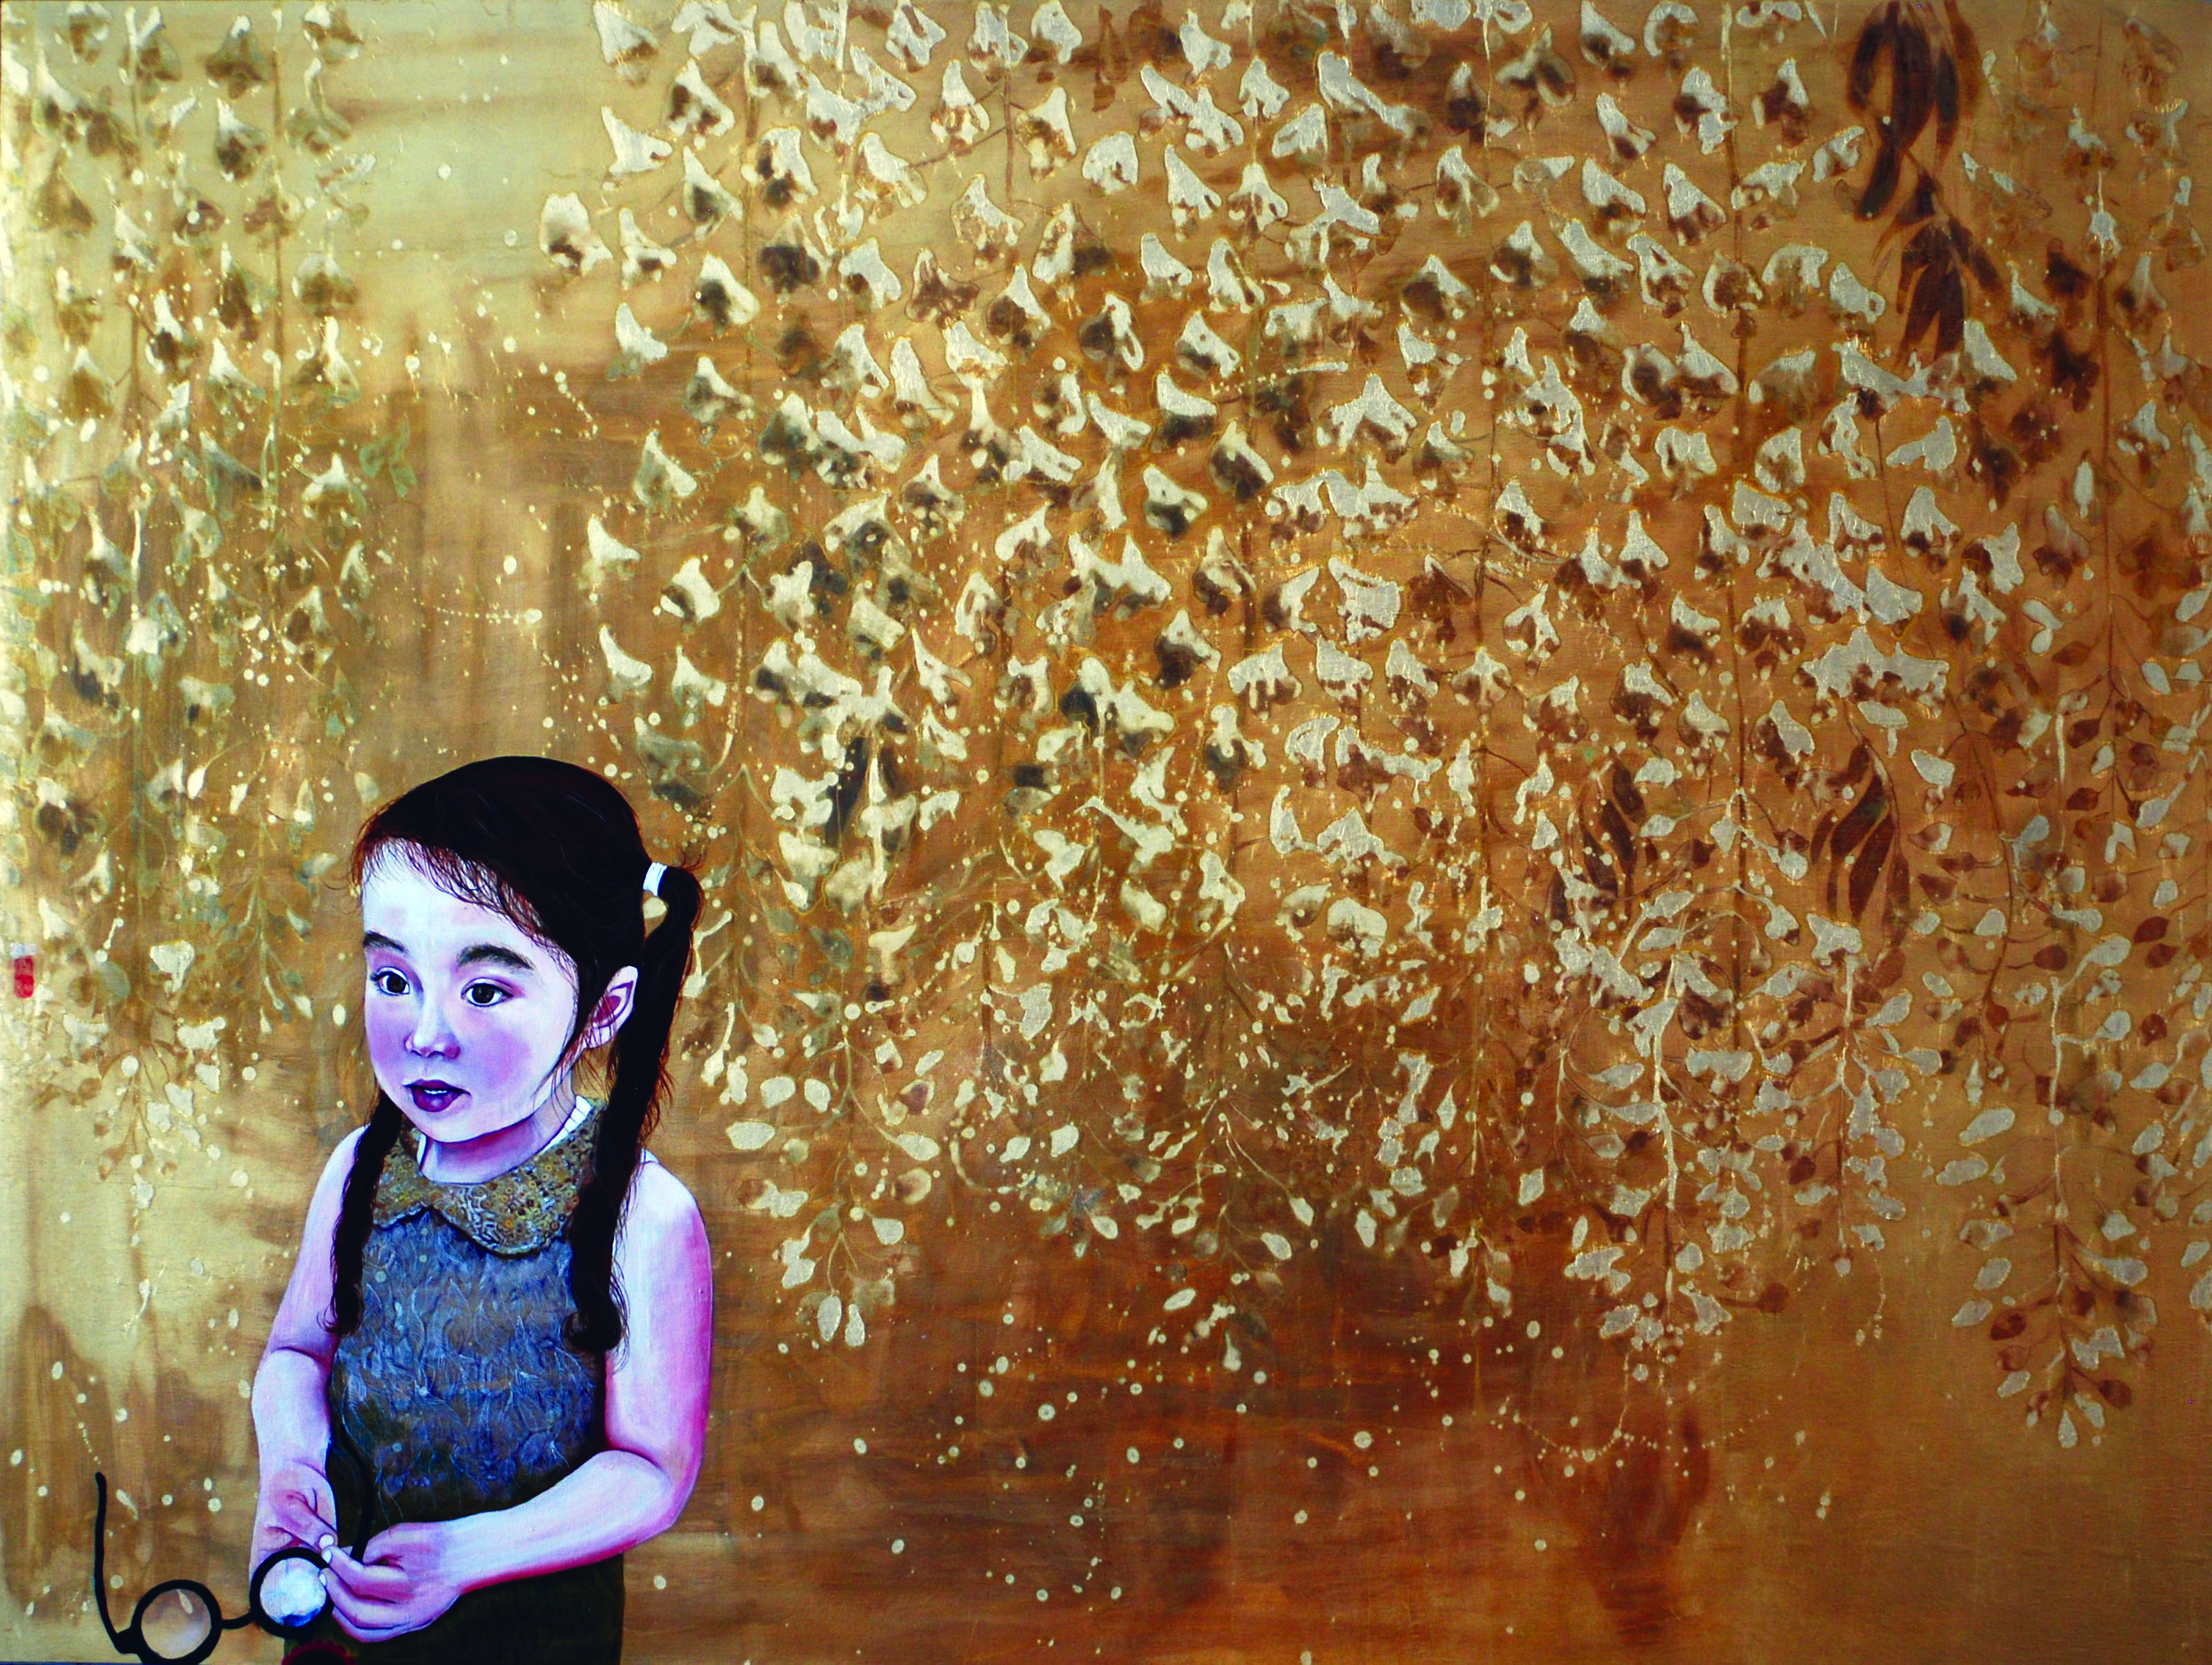 KS-046, Kae Sasaki, Elegant Hostility, 2015, Oil and Patina on Goldleafed Panel, 36X48